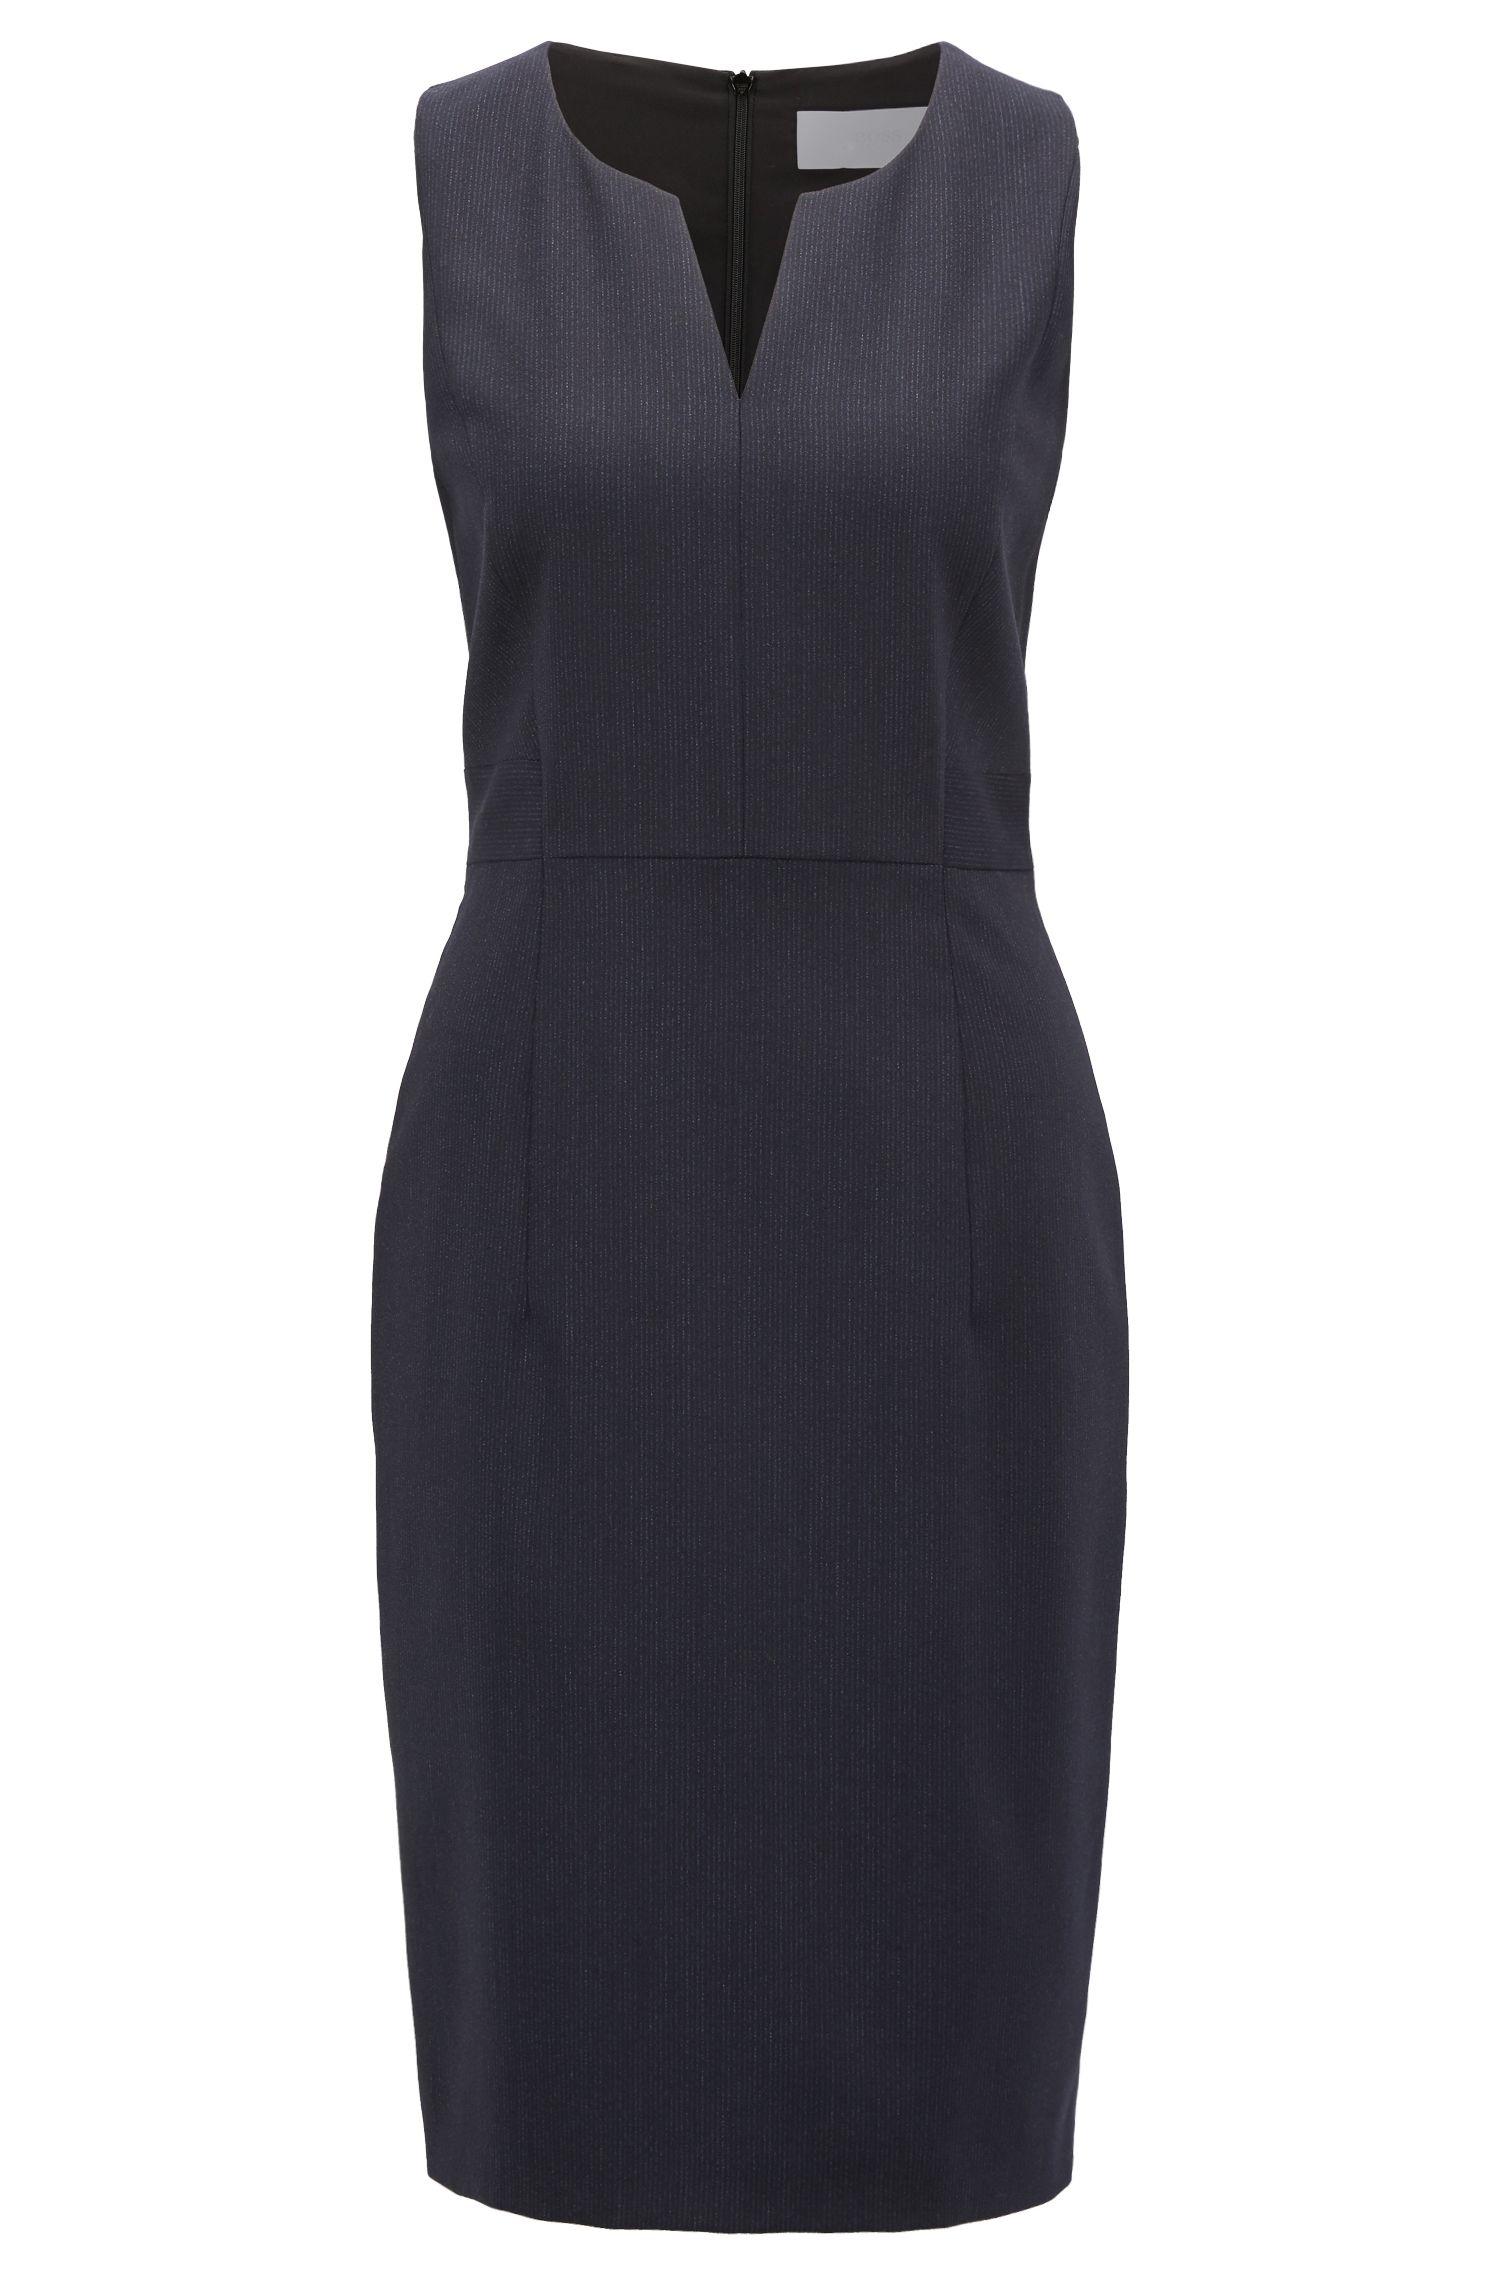 Sleeveless dress in stretch virgin wool, Patterned